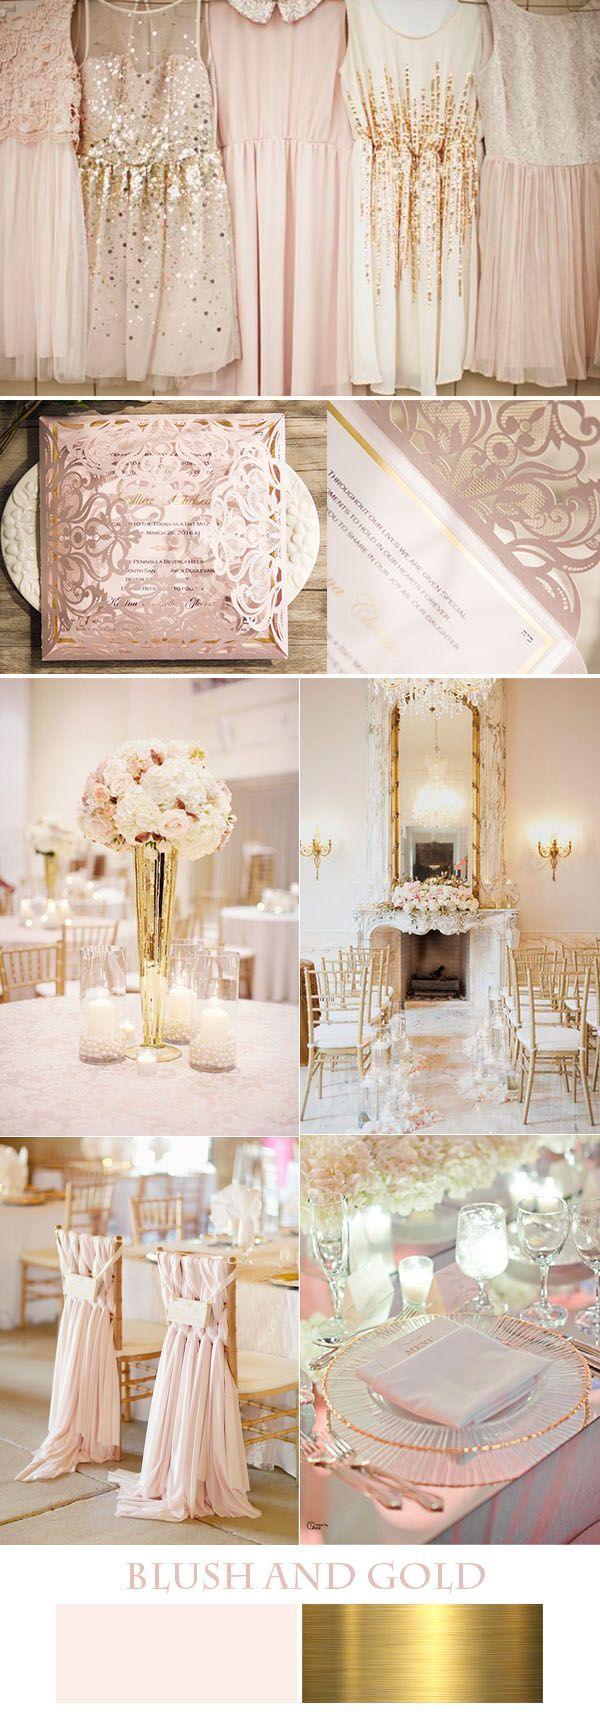 best dream wedding images on pinterest wedding ideas dream